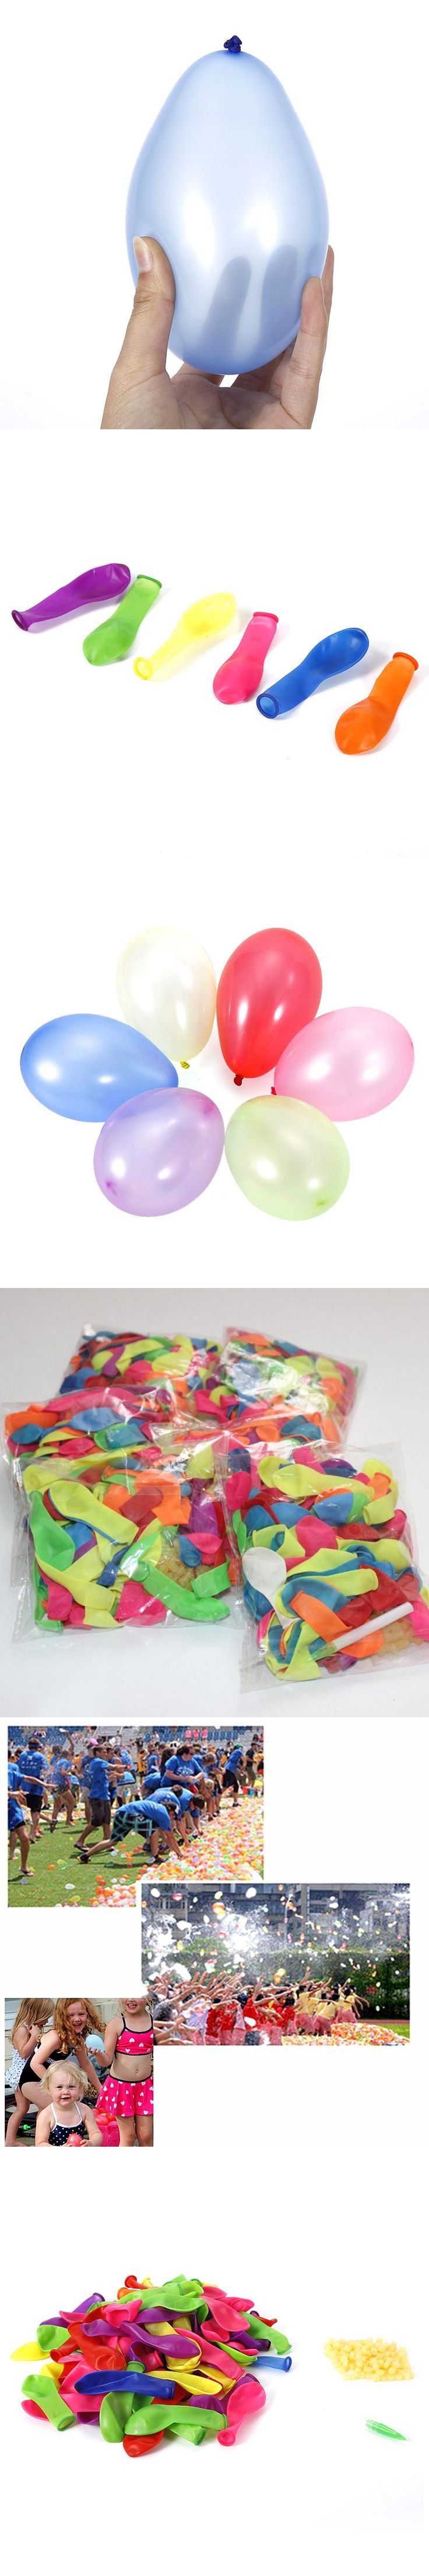 120pcs+120 rubber +1 tool small balloons Water polo round multicolor latex balloon wedding party summer outdoor fun toy balloons